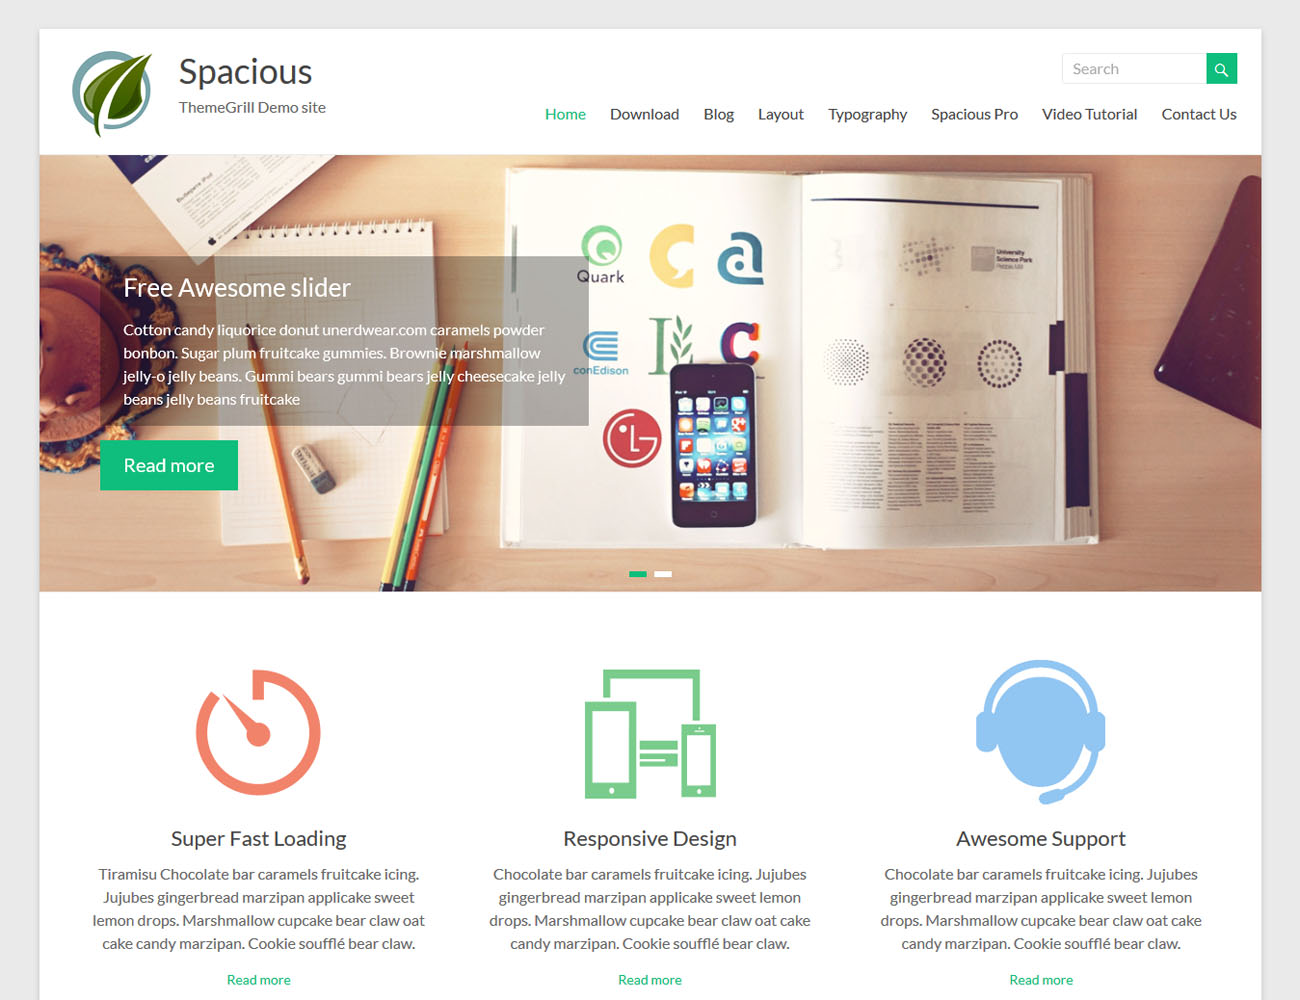 free-responsive-wordpress-themes-spacious-teması-indir-kadir-kişisel-blog